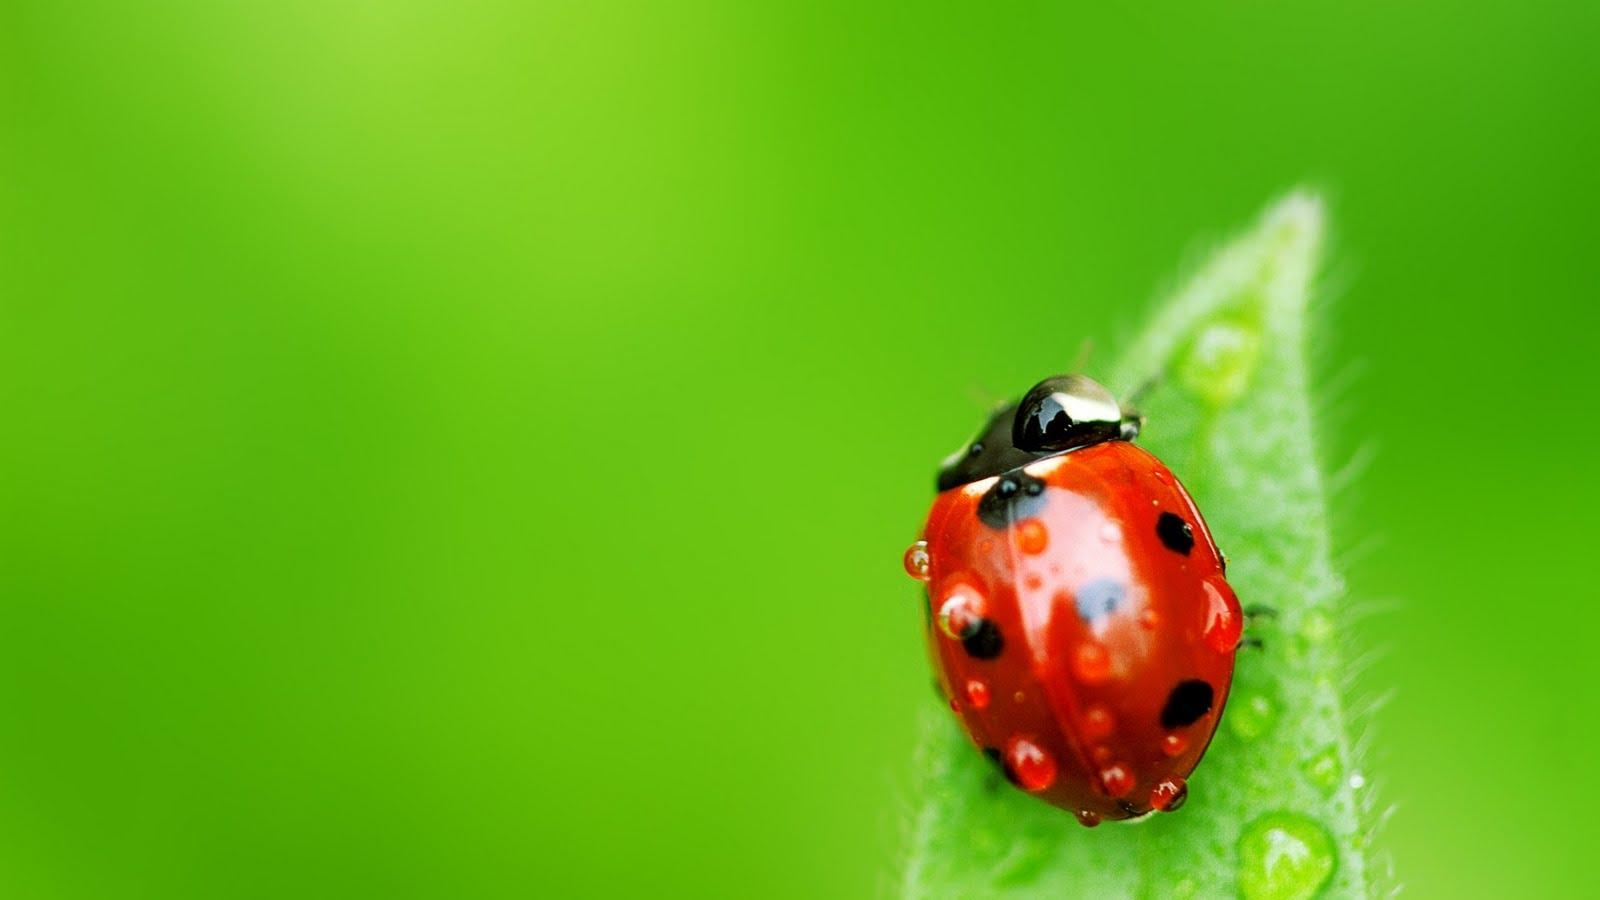 Kaliteli resim u ur b ce i resimleri hd ladybug - Coccinella foto gratis ...